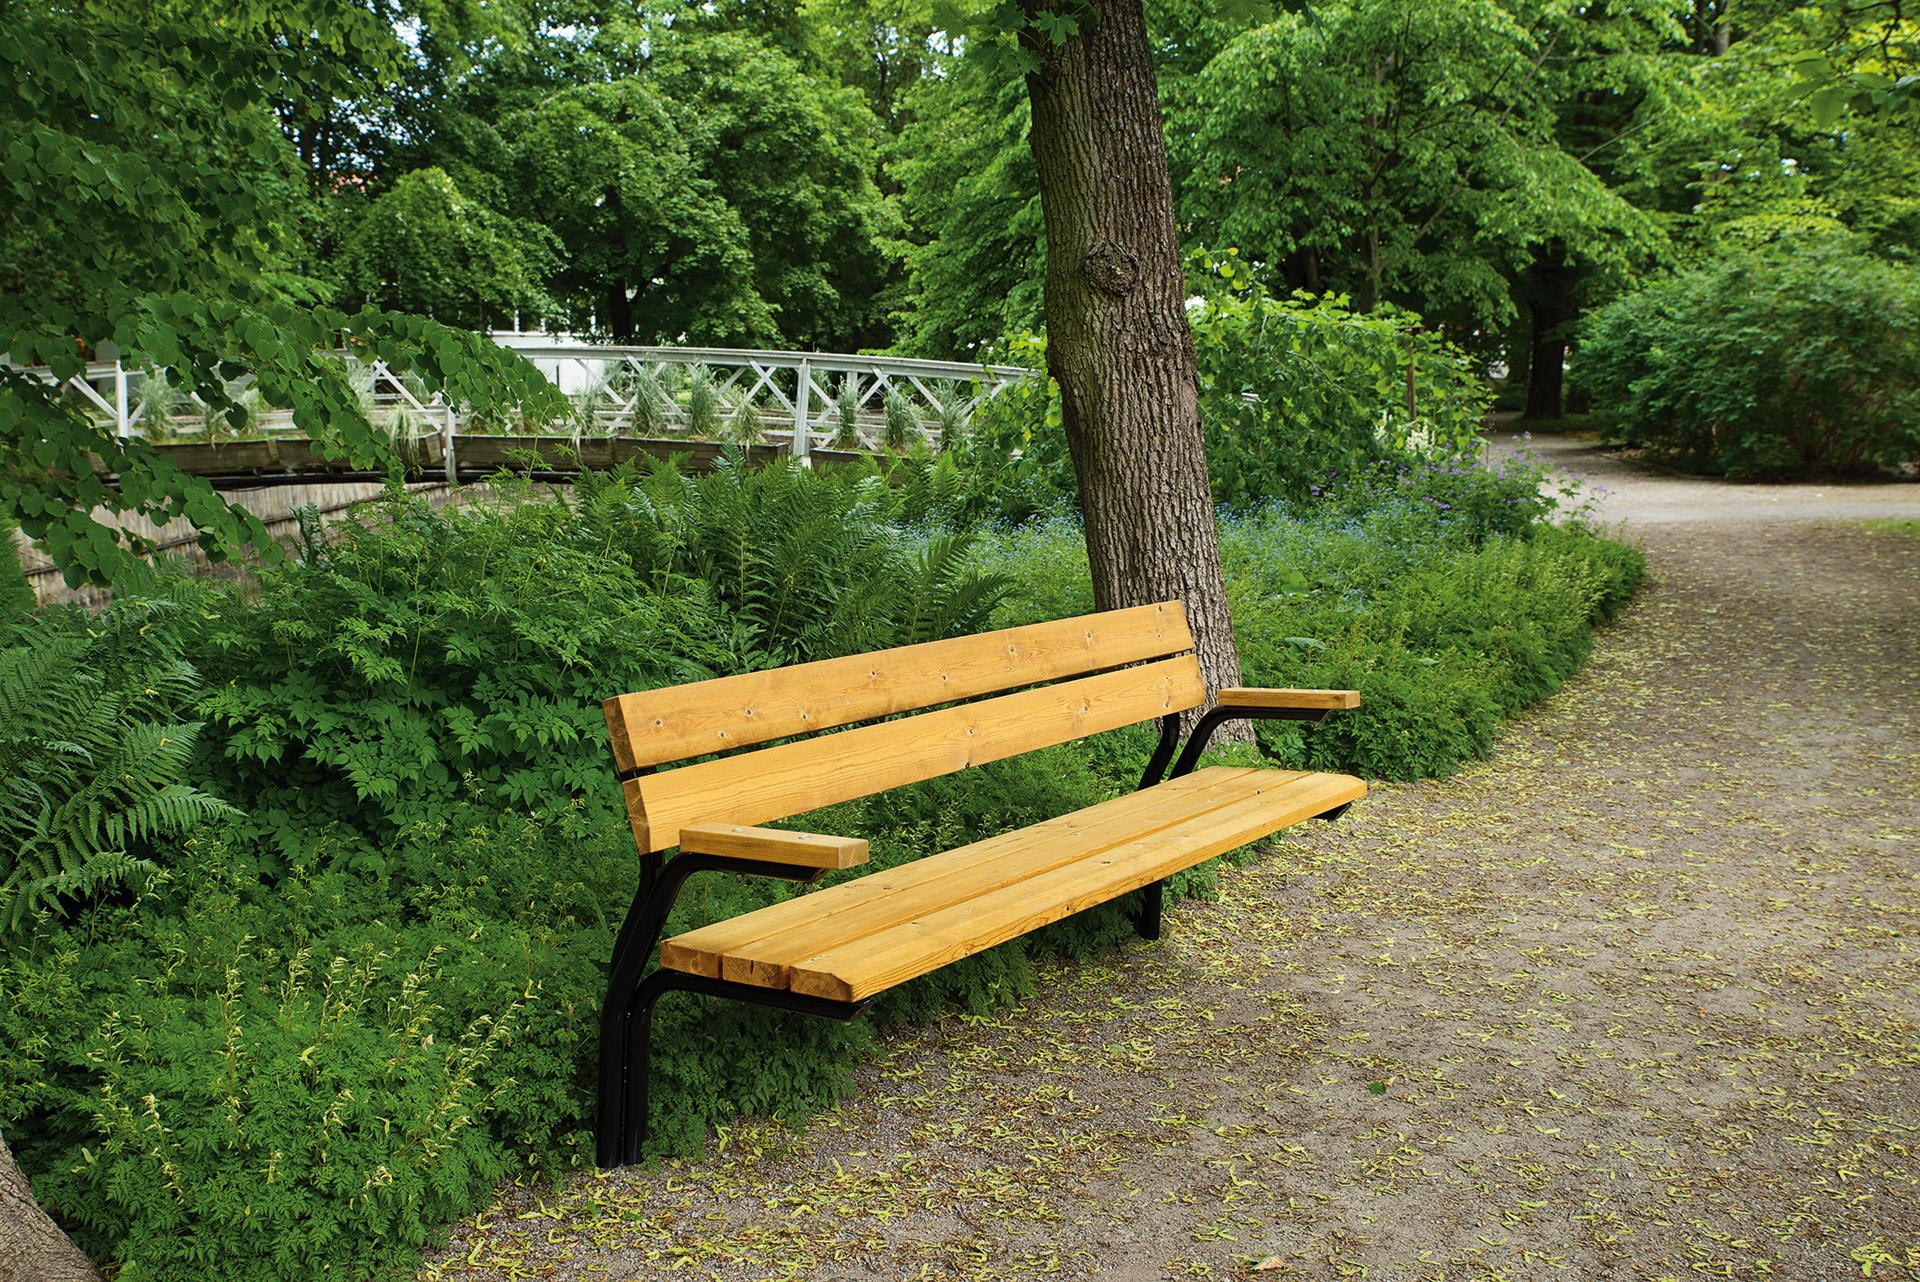 Stylish scandinavian park & street furniture bench